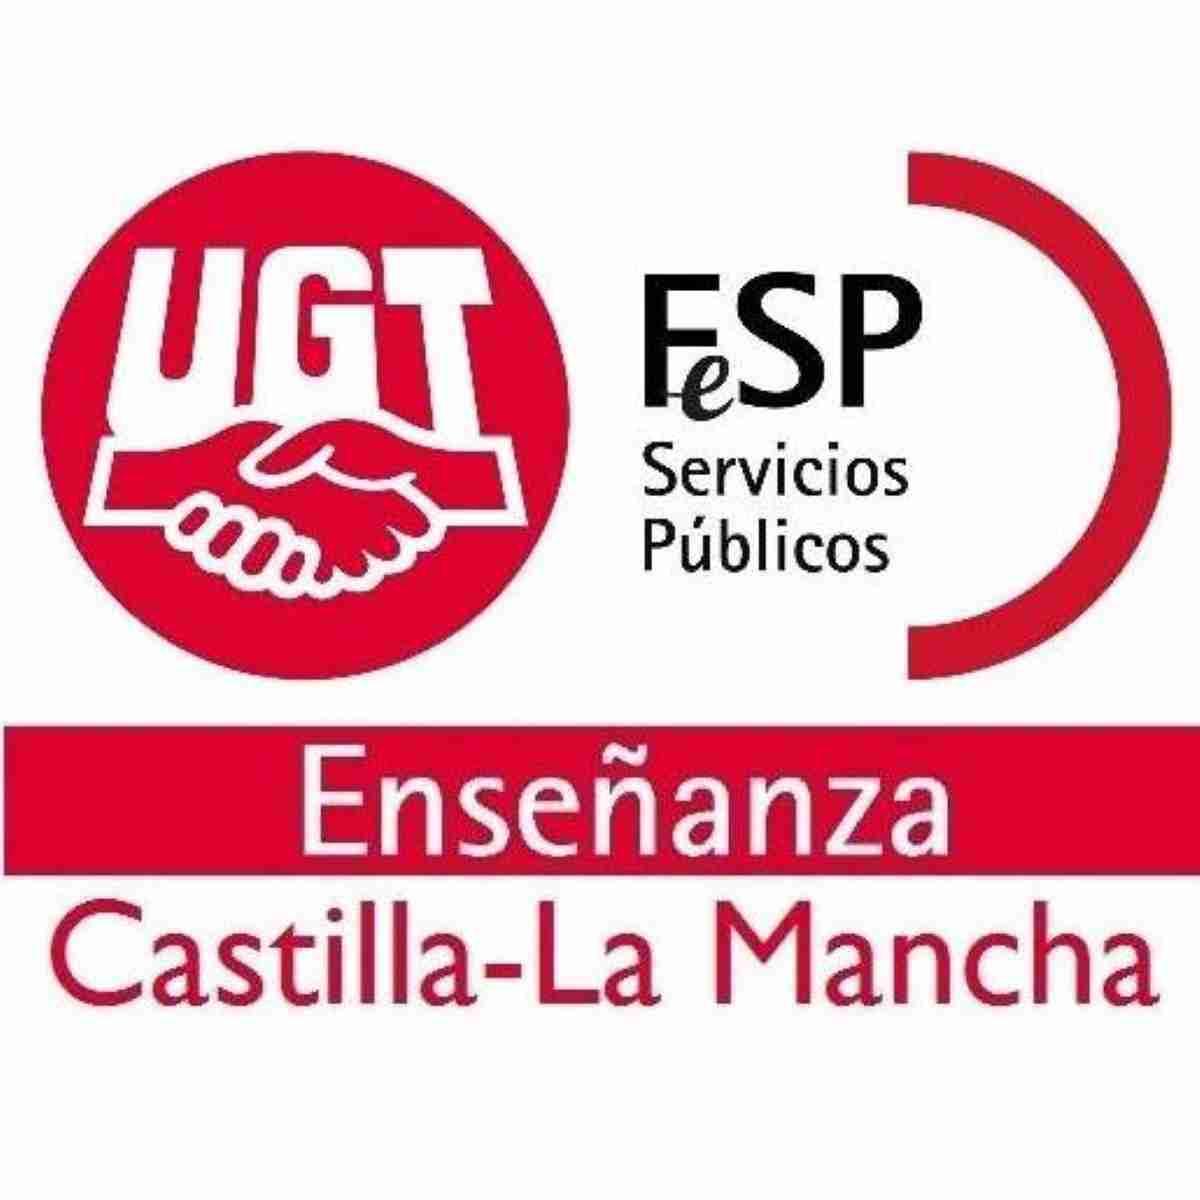 ugt clm considera que sistema educativo regional no esta preparado para abrir centros educativos